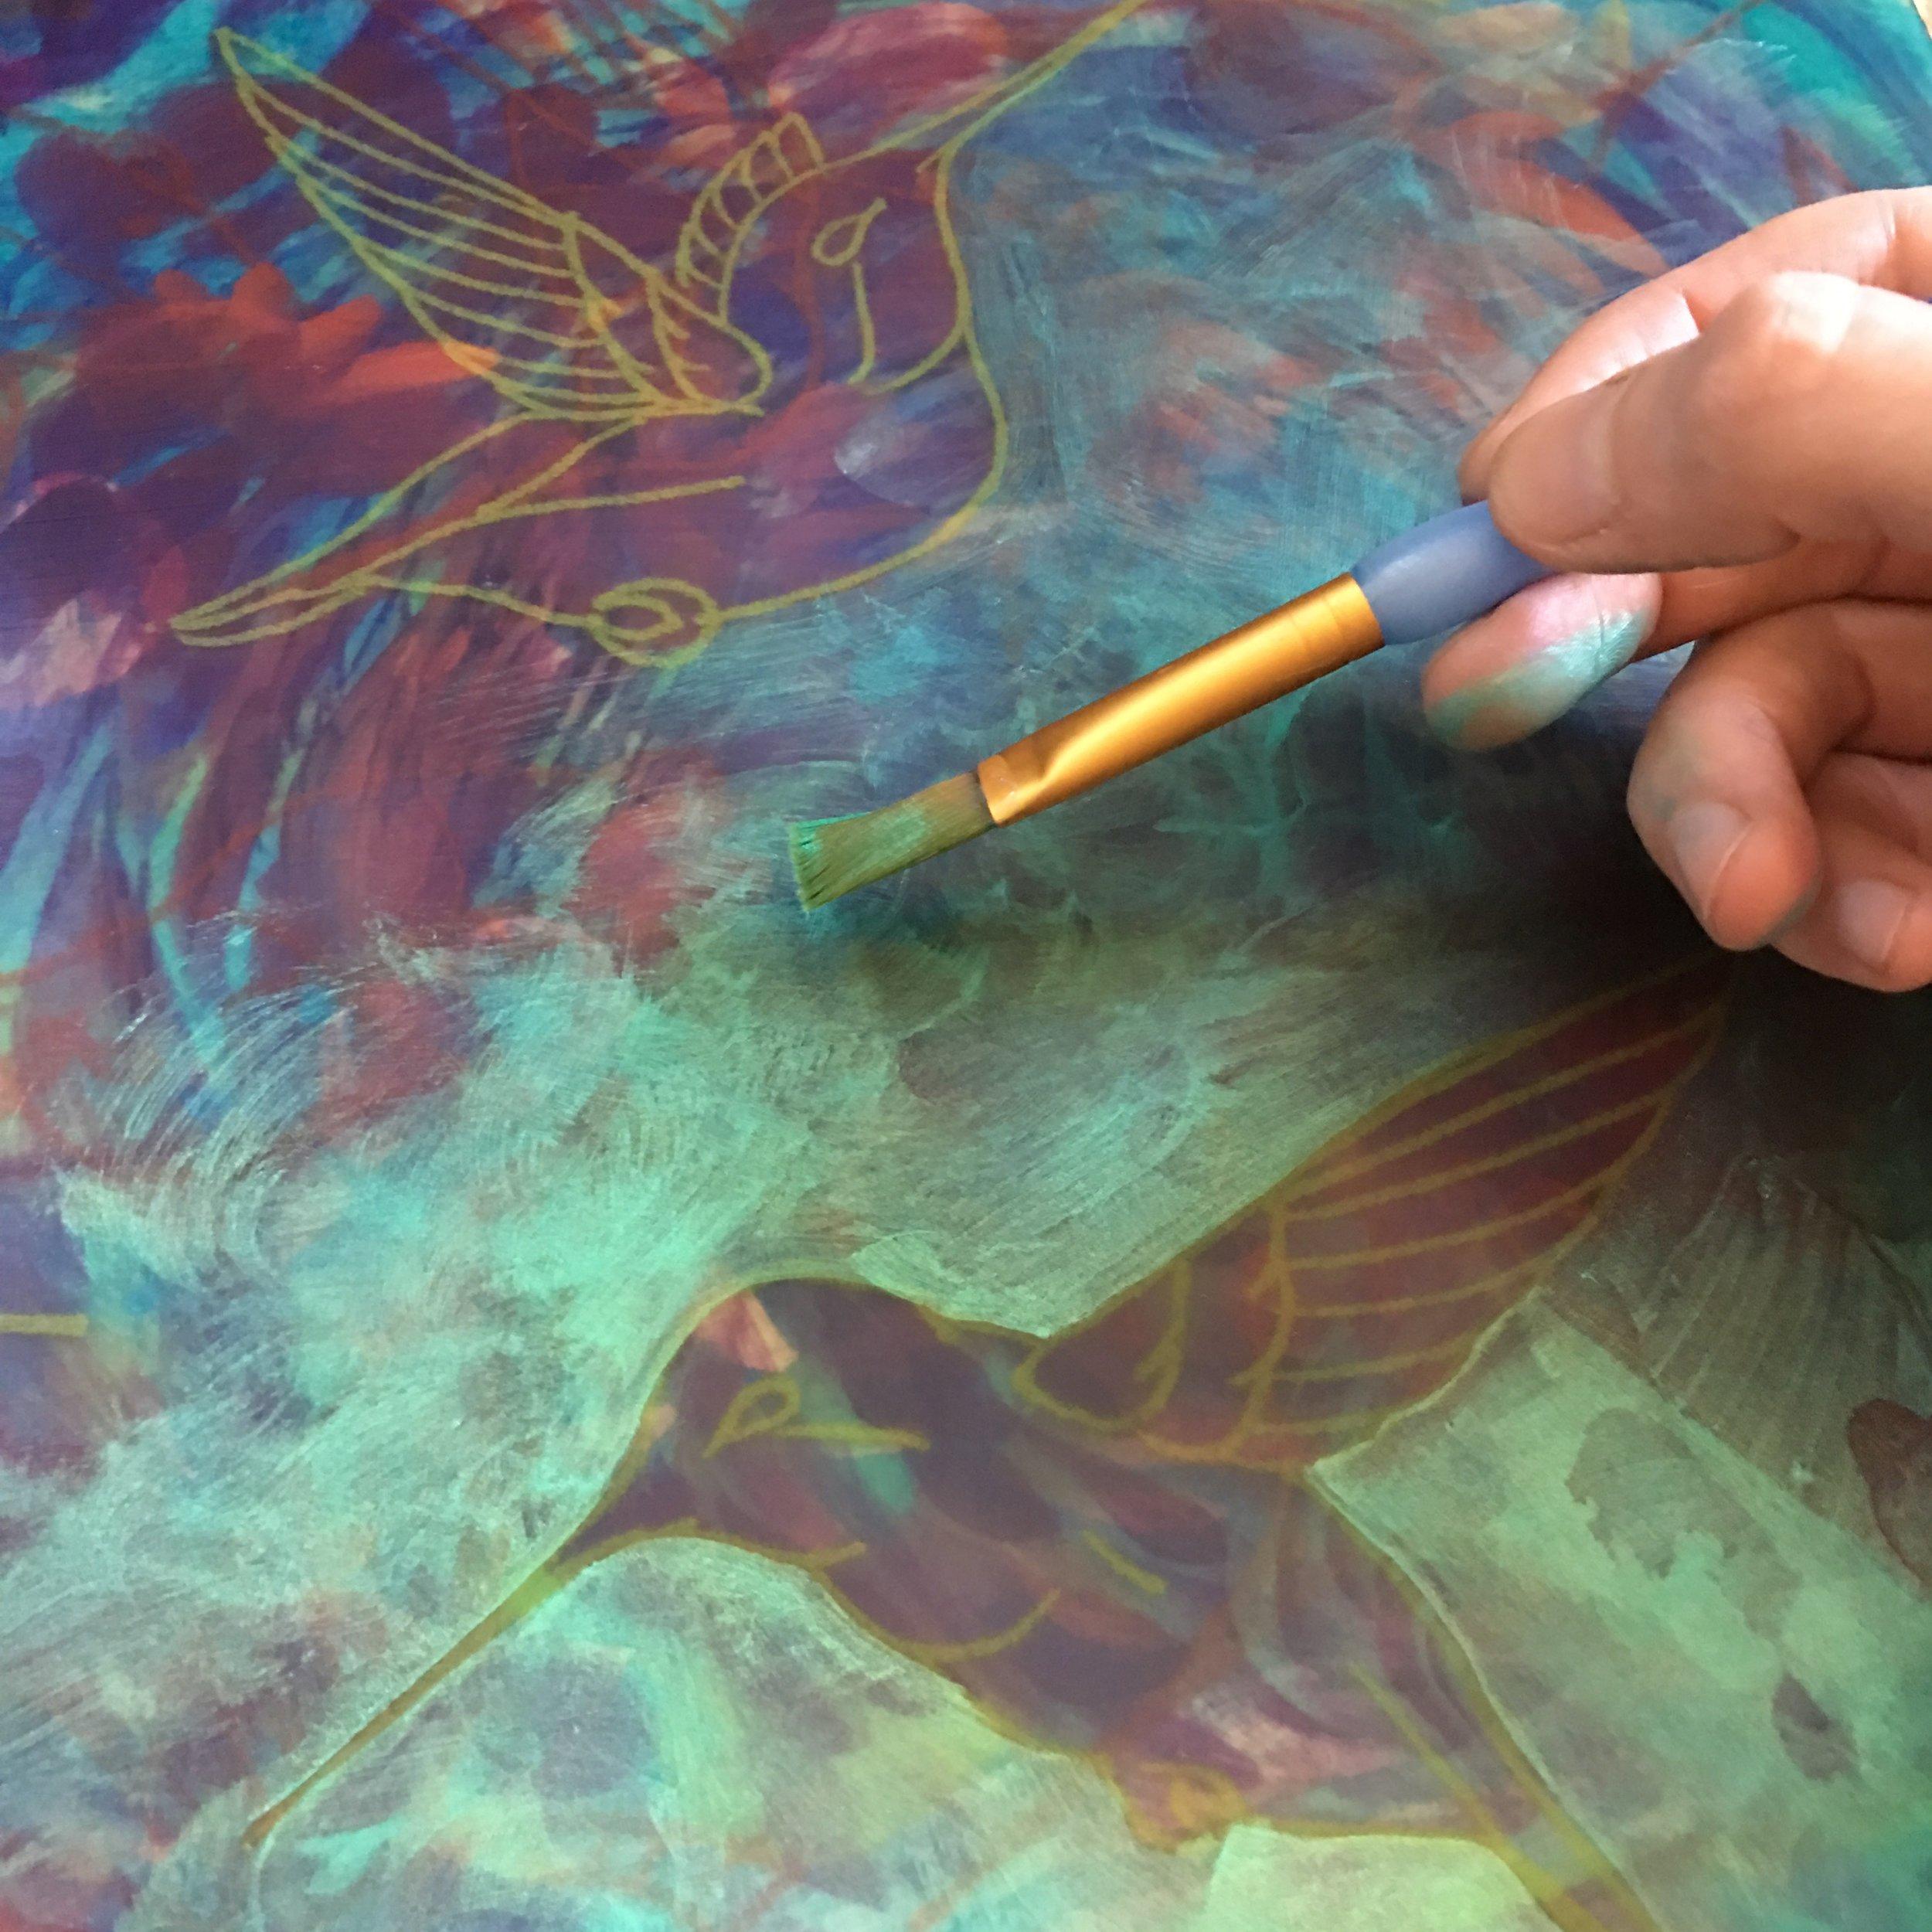 Glaze of iridescent green around transfered bird drawings.